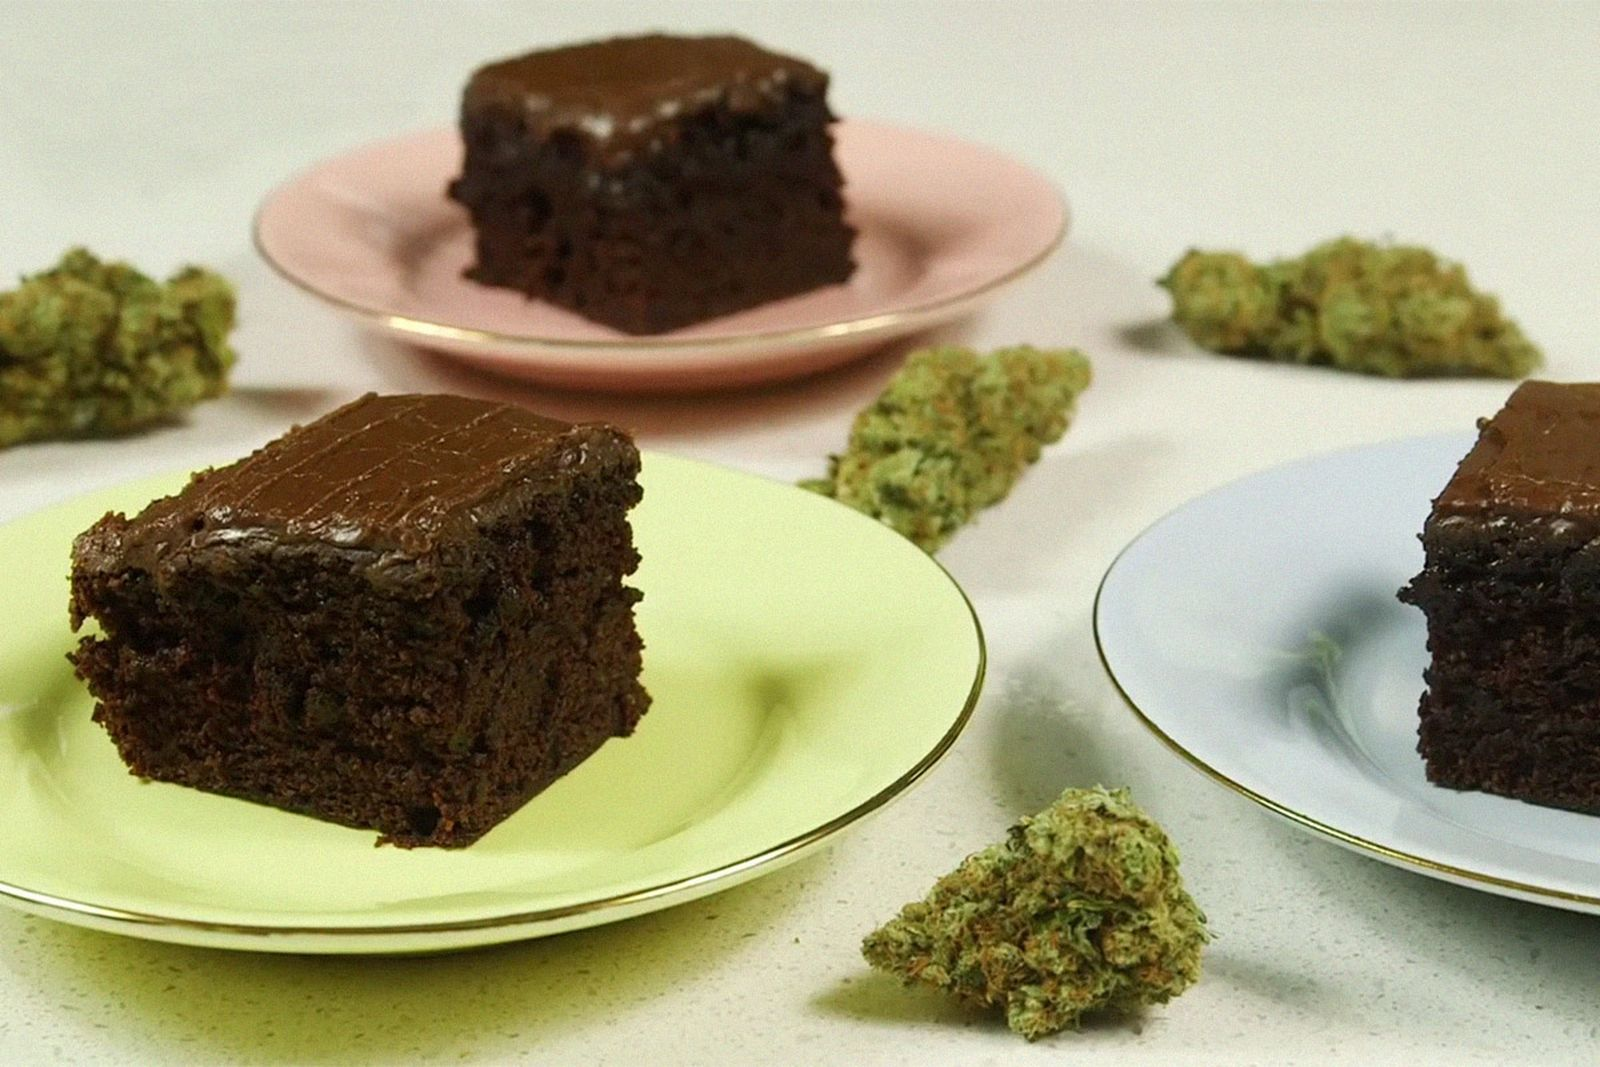 marijuana-health-benefits-eating-002